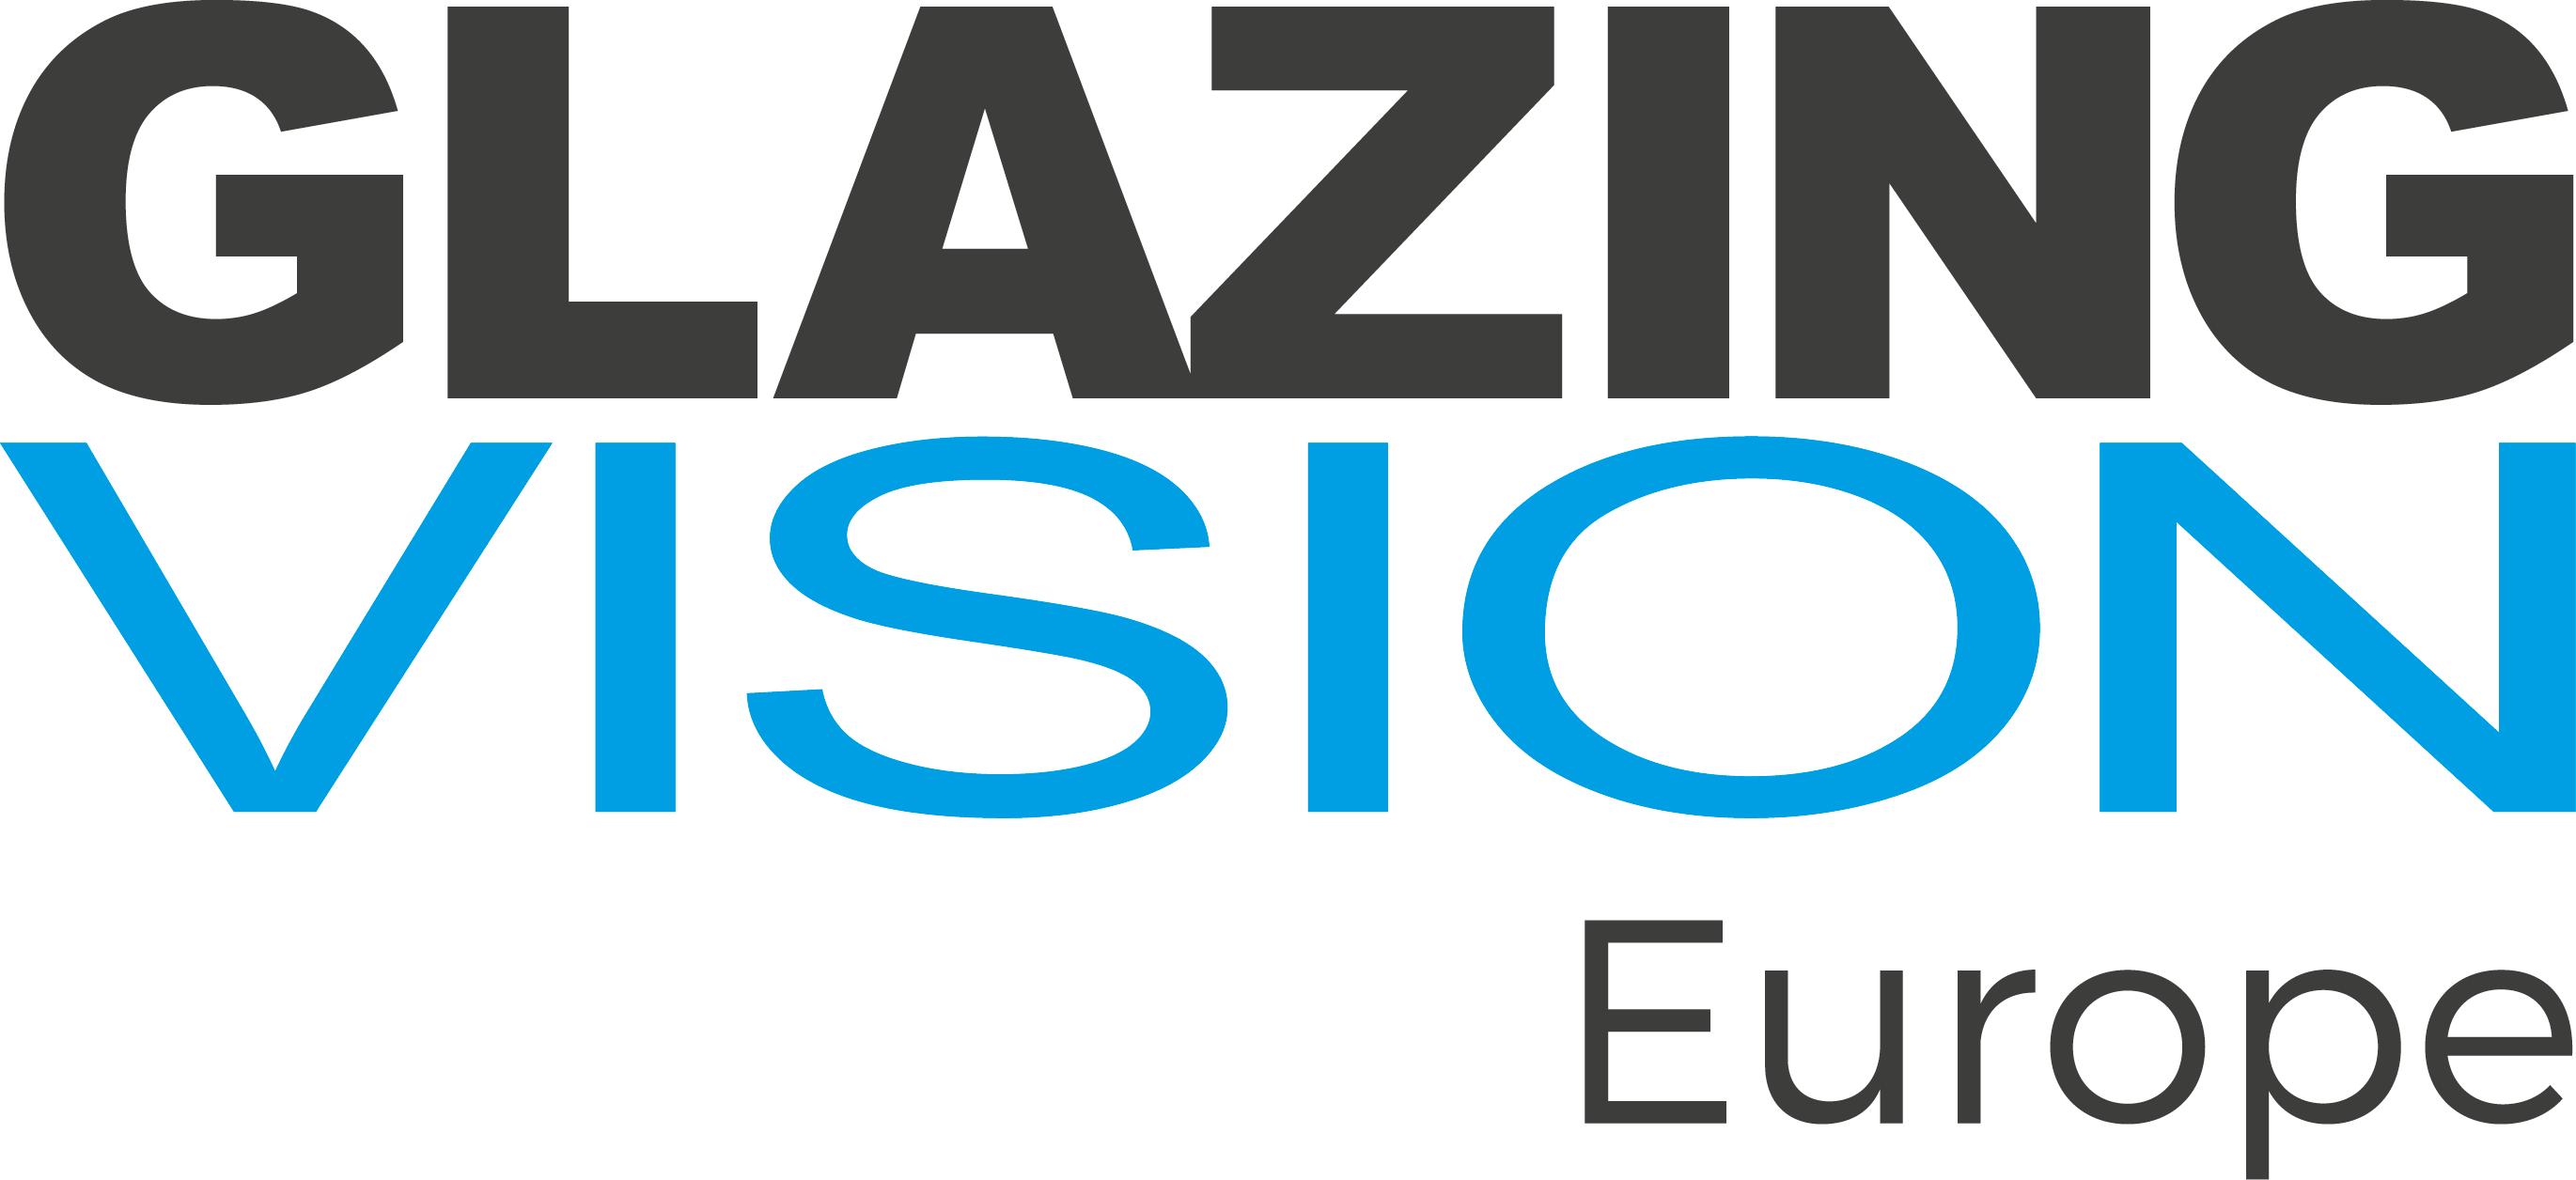 Glazing Vision Europe